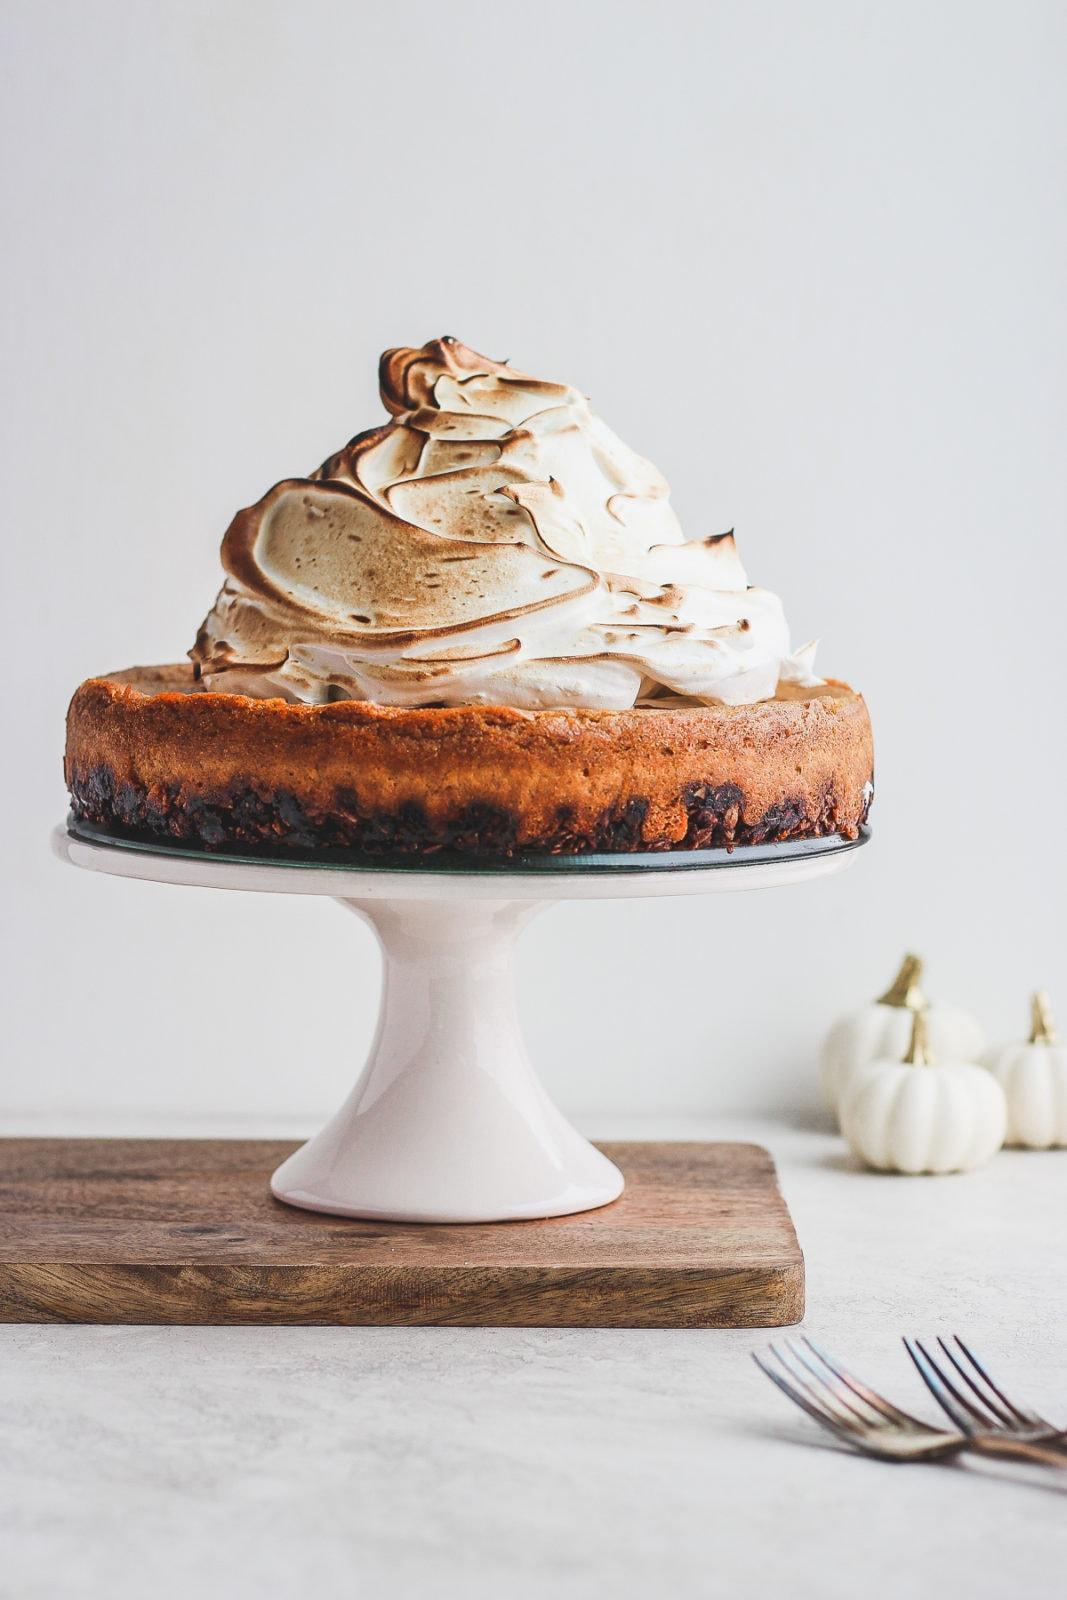 Creamy Vegan Baked Pumpkin Pie Cheesecake - a deliciously dreamy baked vegan pumpkin pie cheesecake - perfect dairy-free dessert option for Thanksgiving! #dairyfree #vegan #thanksgiving #pumpkinpie